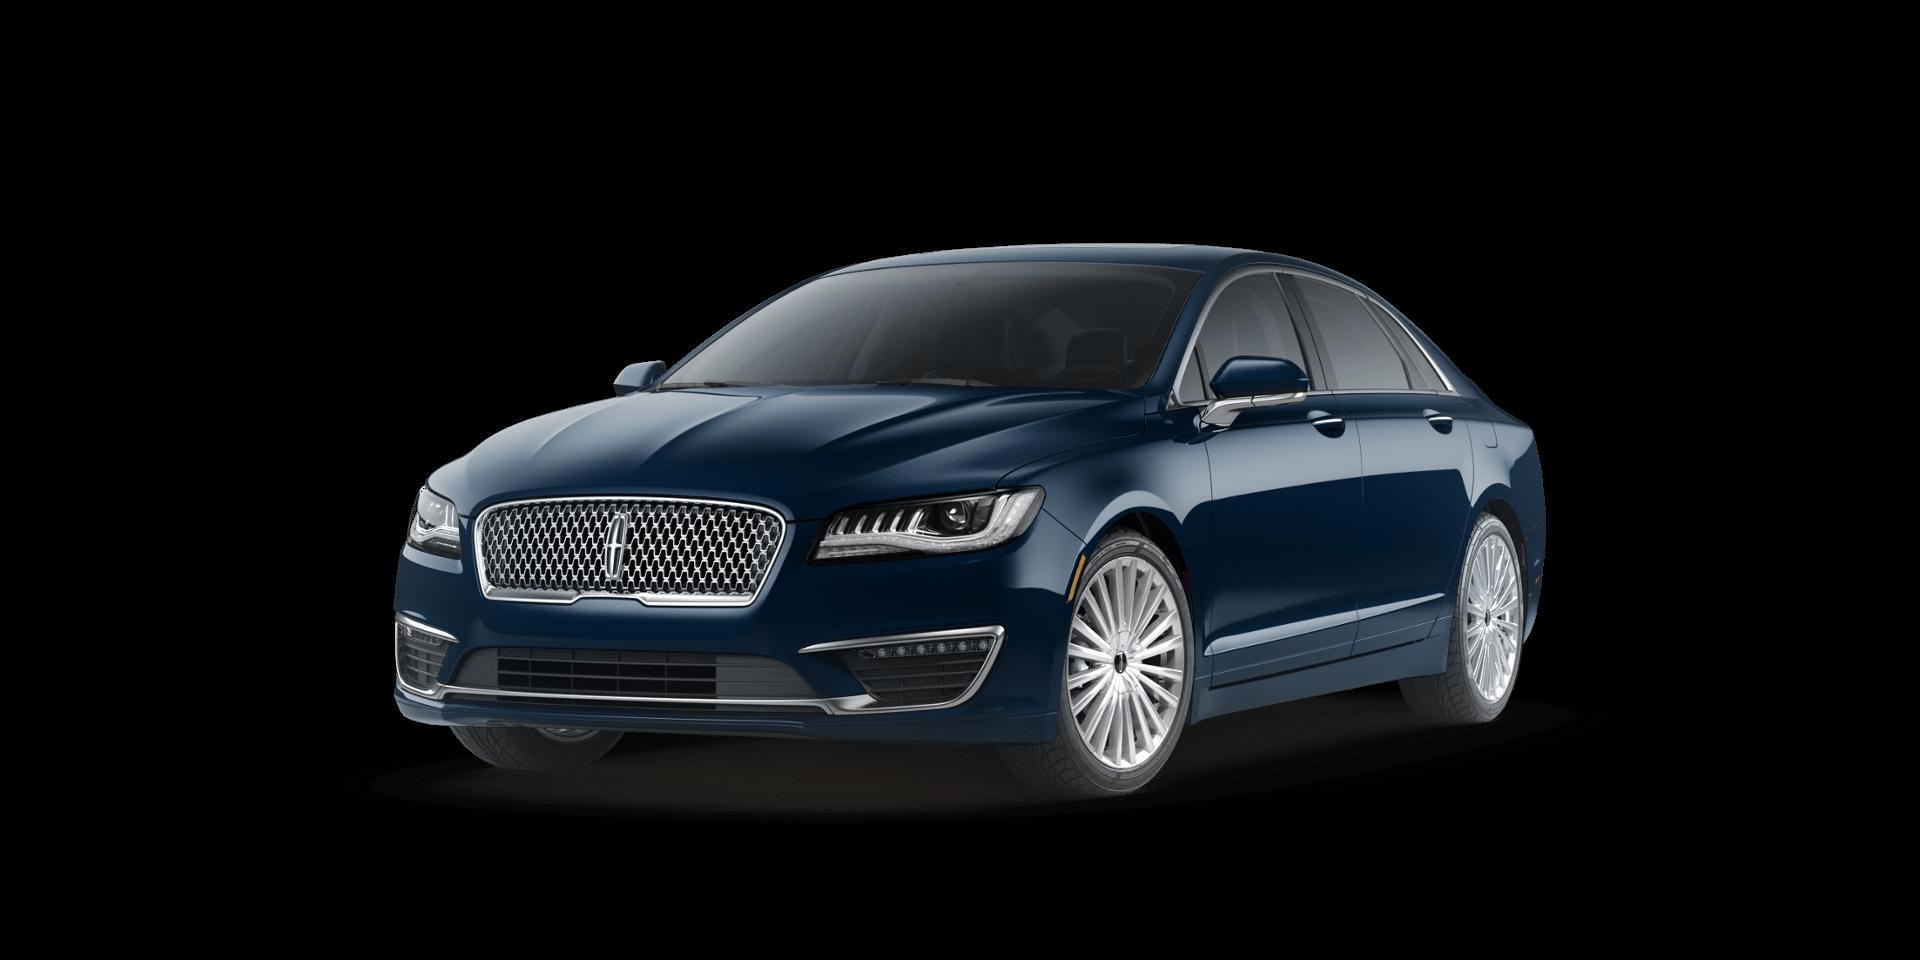 2017 Lincoln Mkz Build Price Lincoln Mkz Lincoln Cars Super Luxury Cars